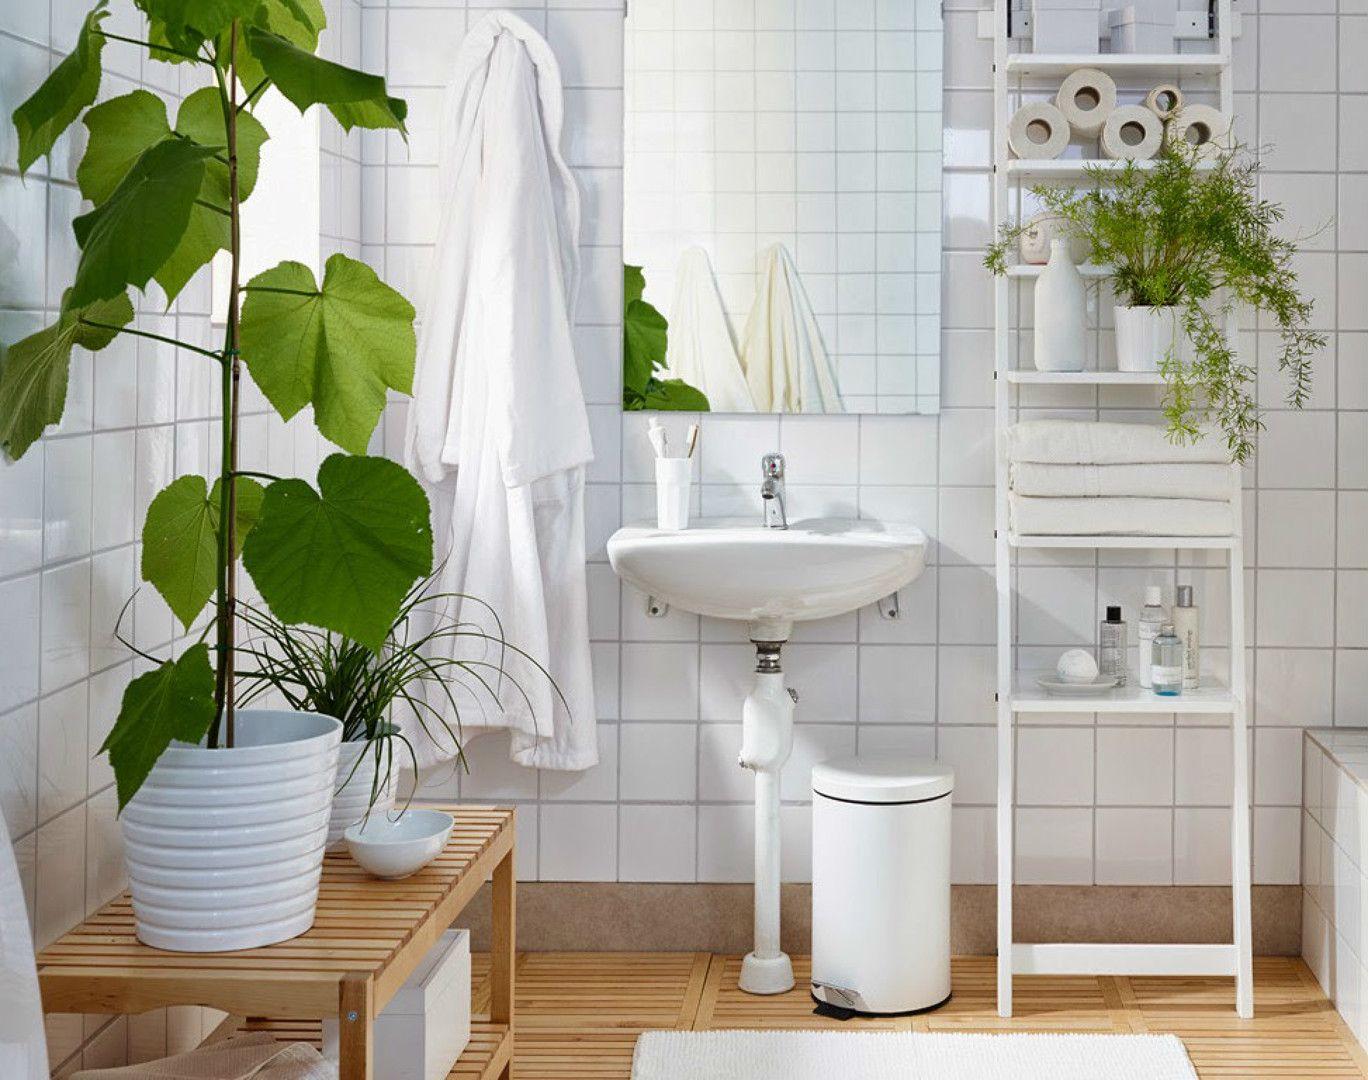 Mueble auxiliar small esmas pinterest ba os cuarto de ba o y muebles auxiliares Ikea mueble auxiliar bano